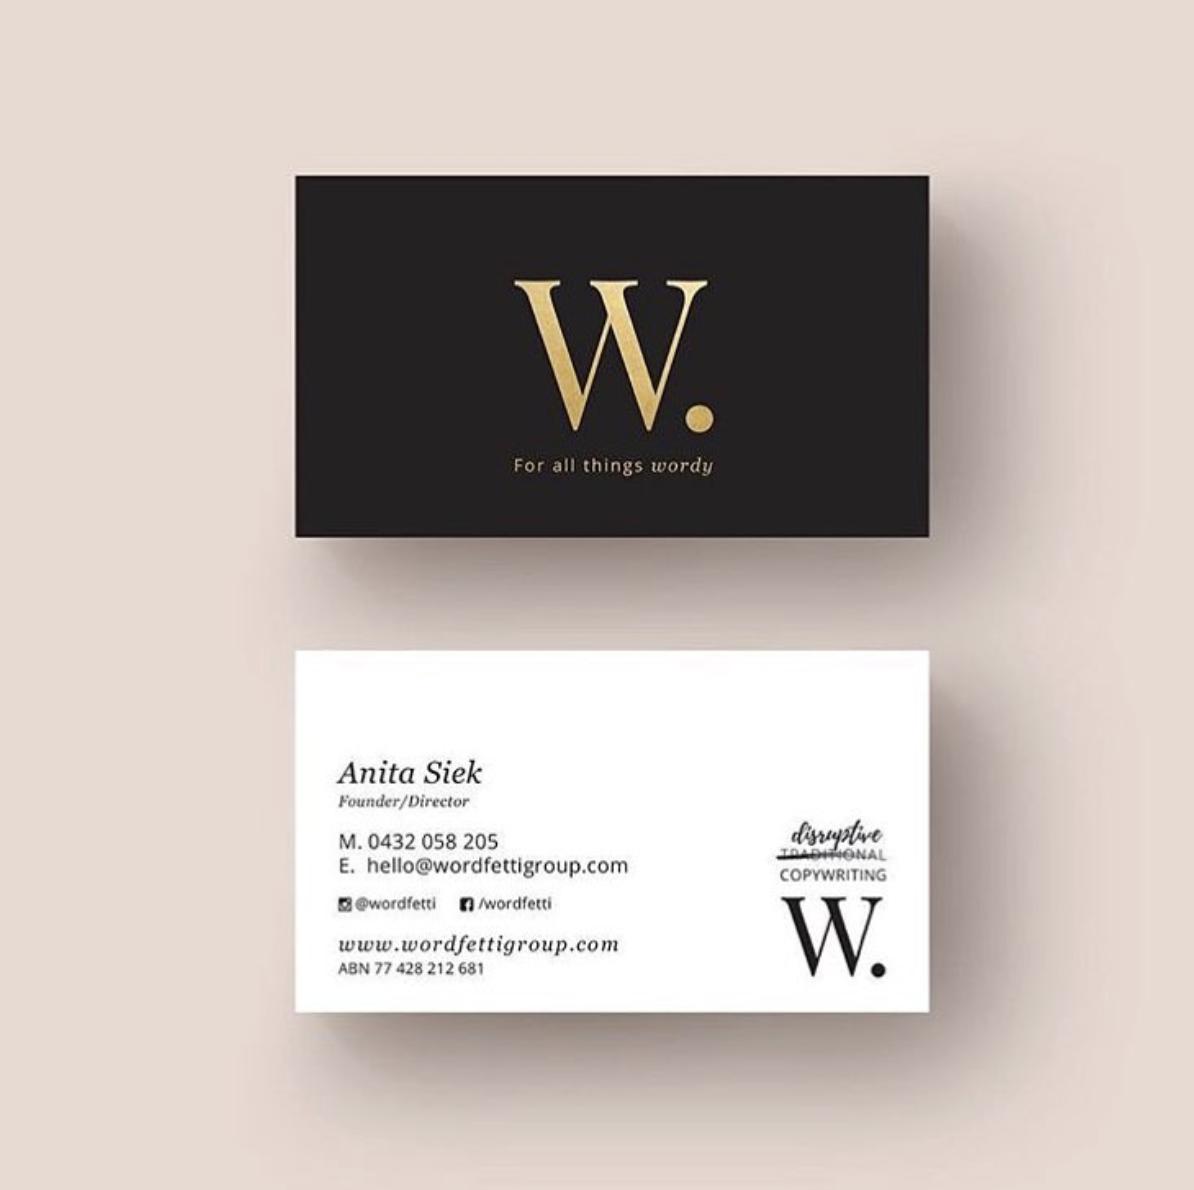 Wordfetti Business Card Branding   Wordfetti   Pinterest ...